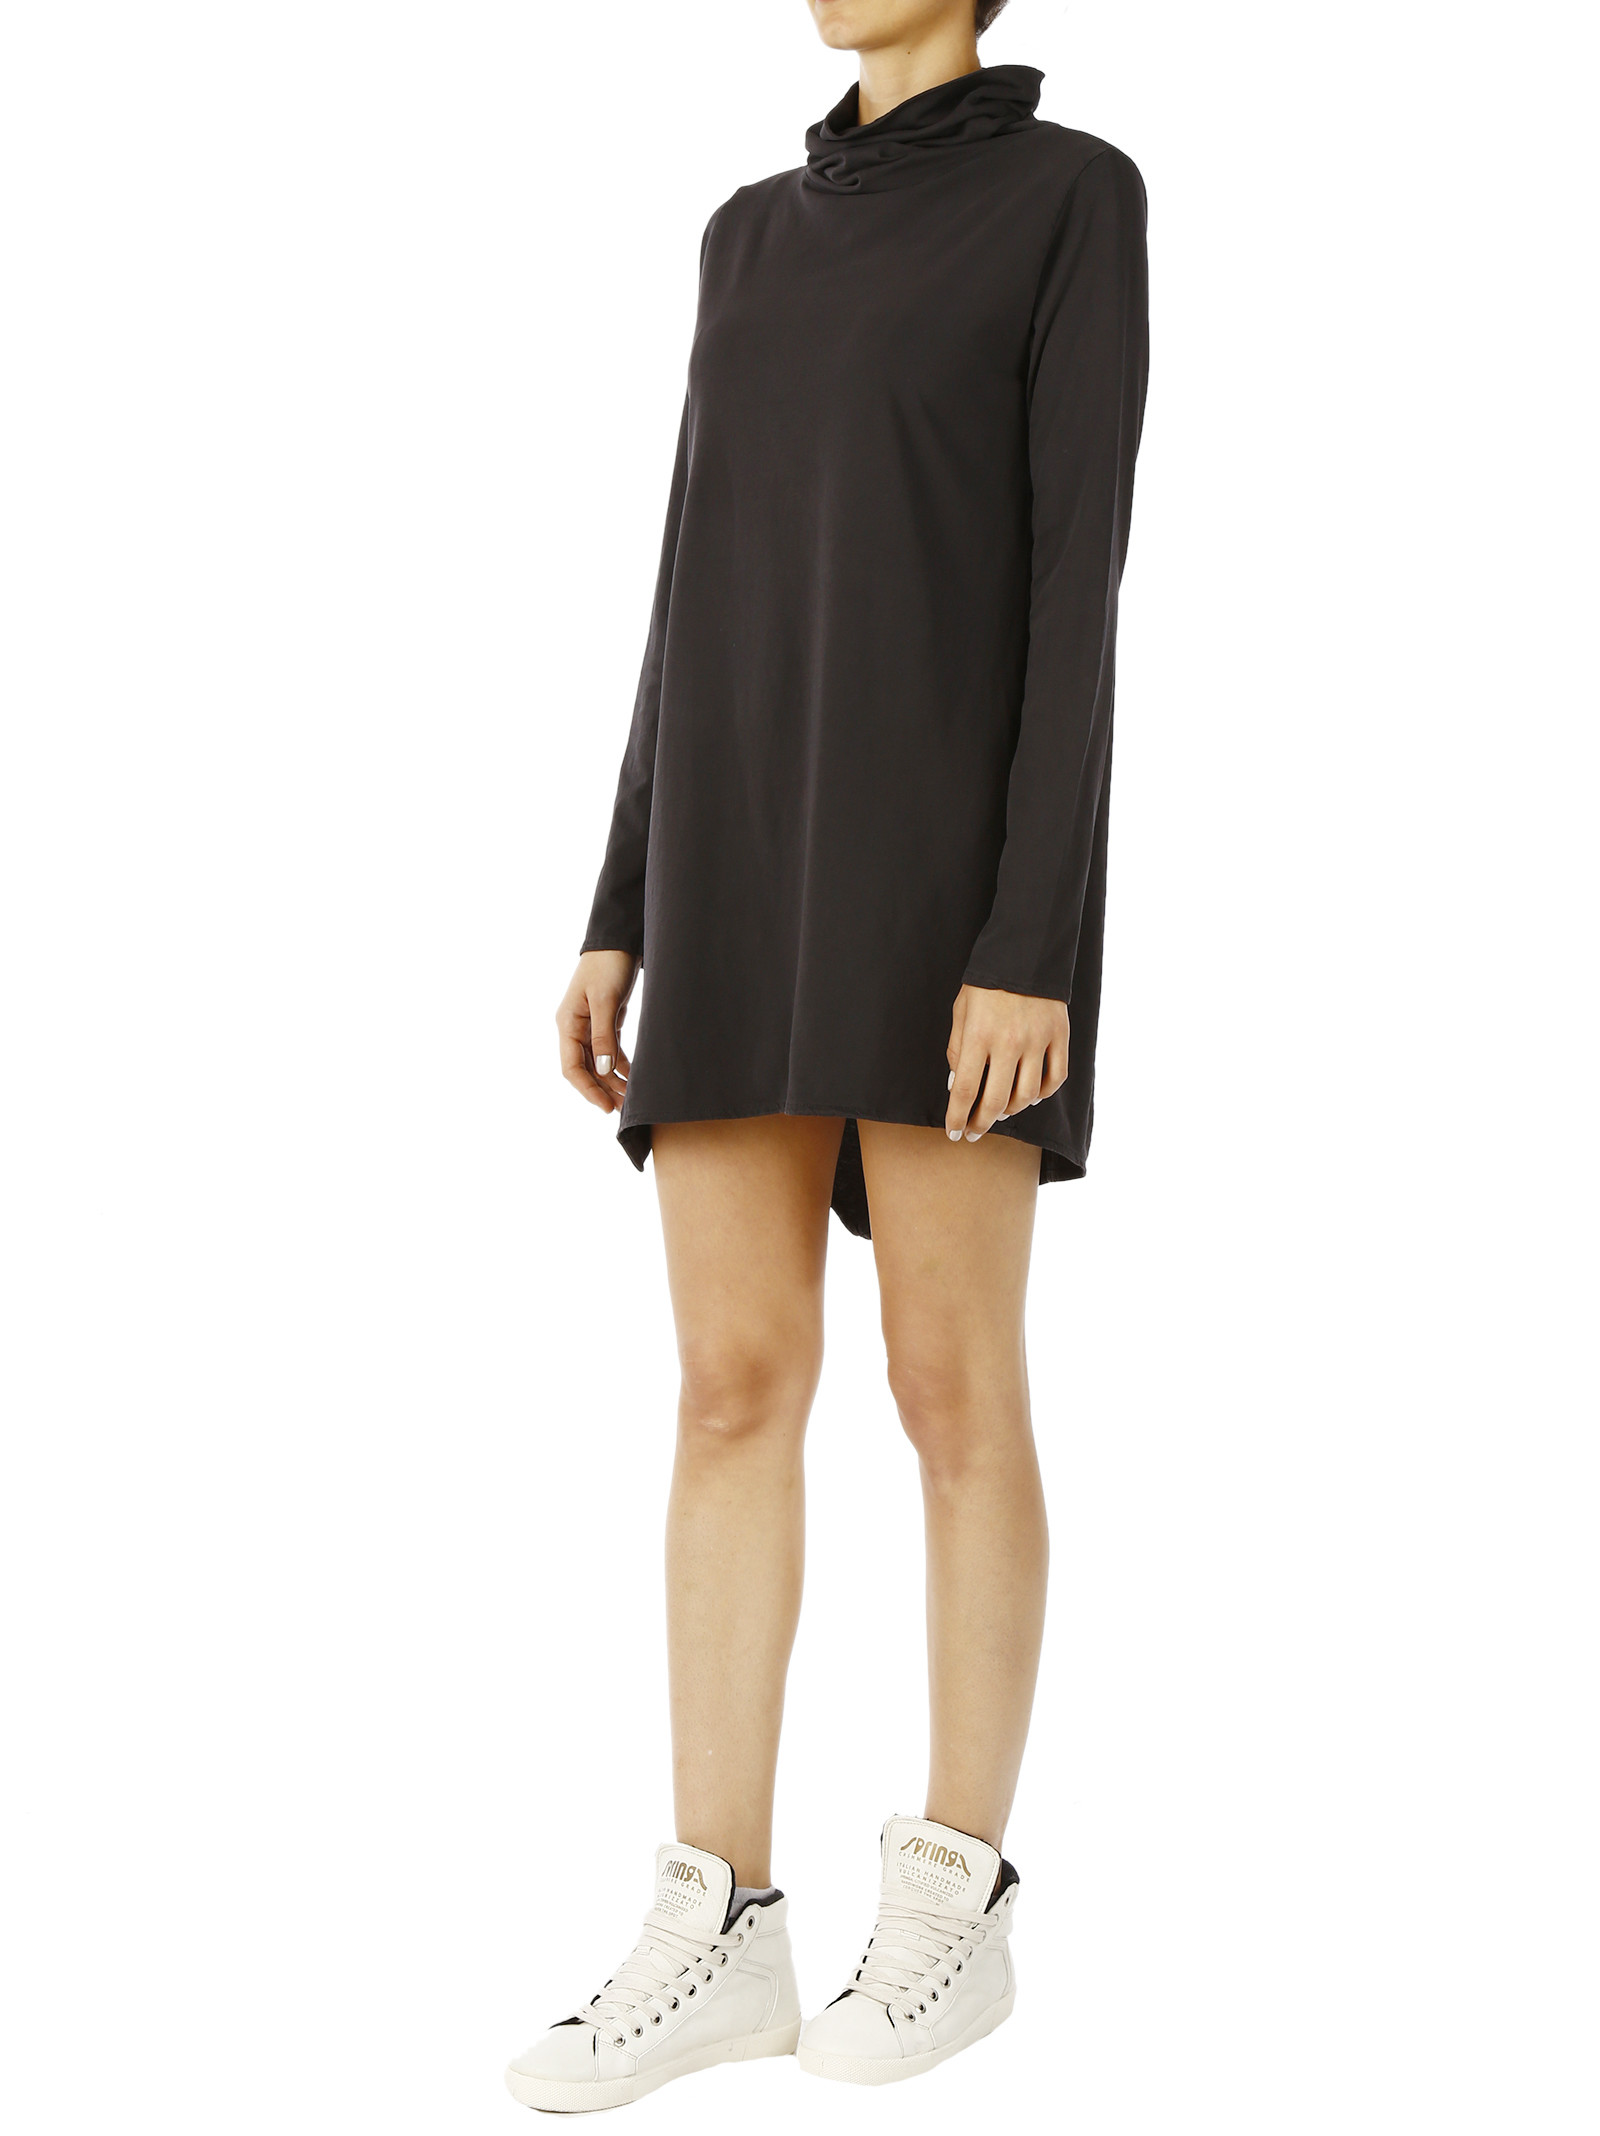 Altalana 100% Cotton High -neck Irregular Cut Dress